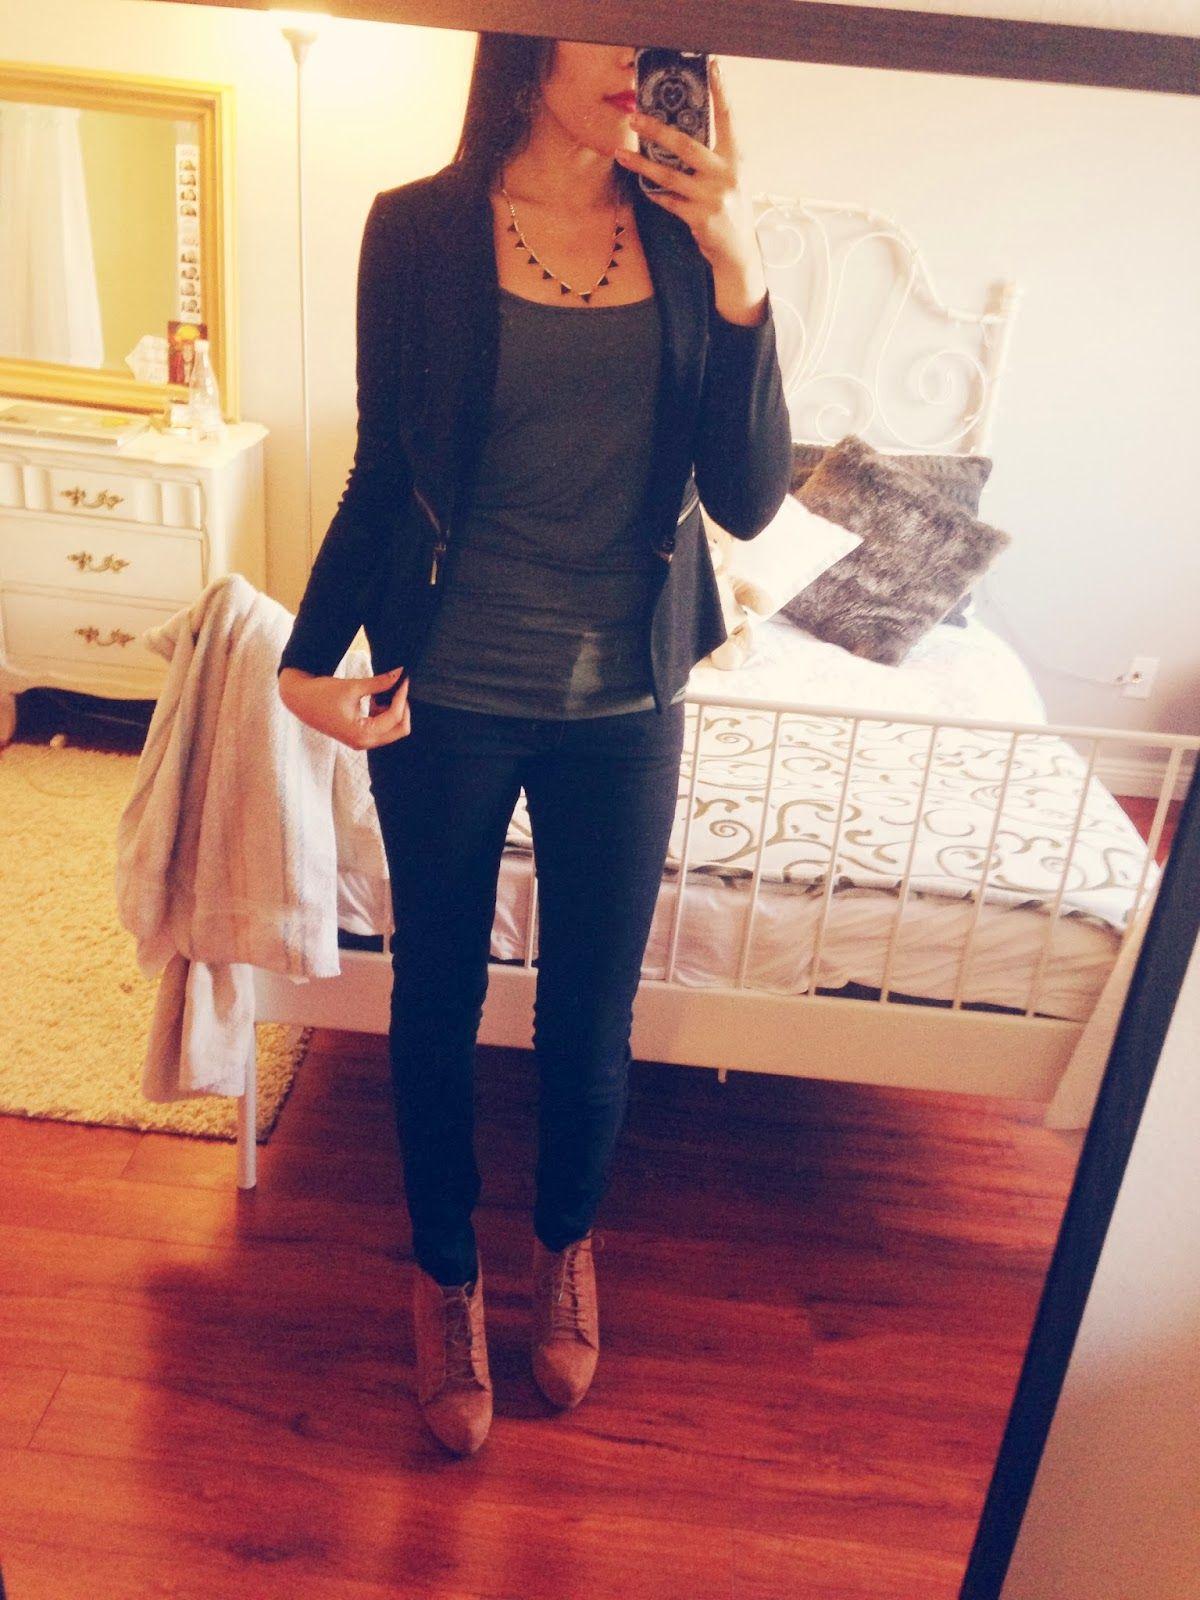 Interview job receptionist what to wear